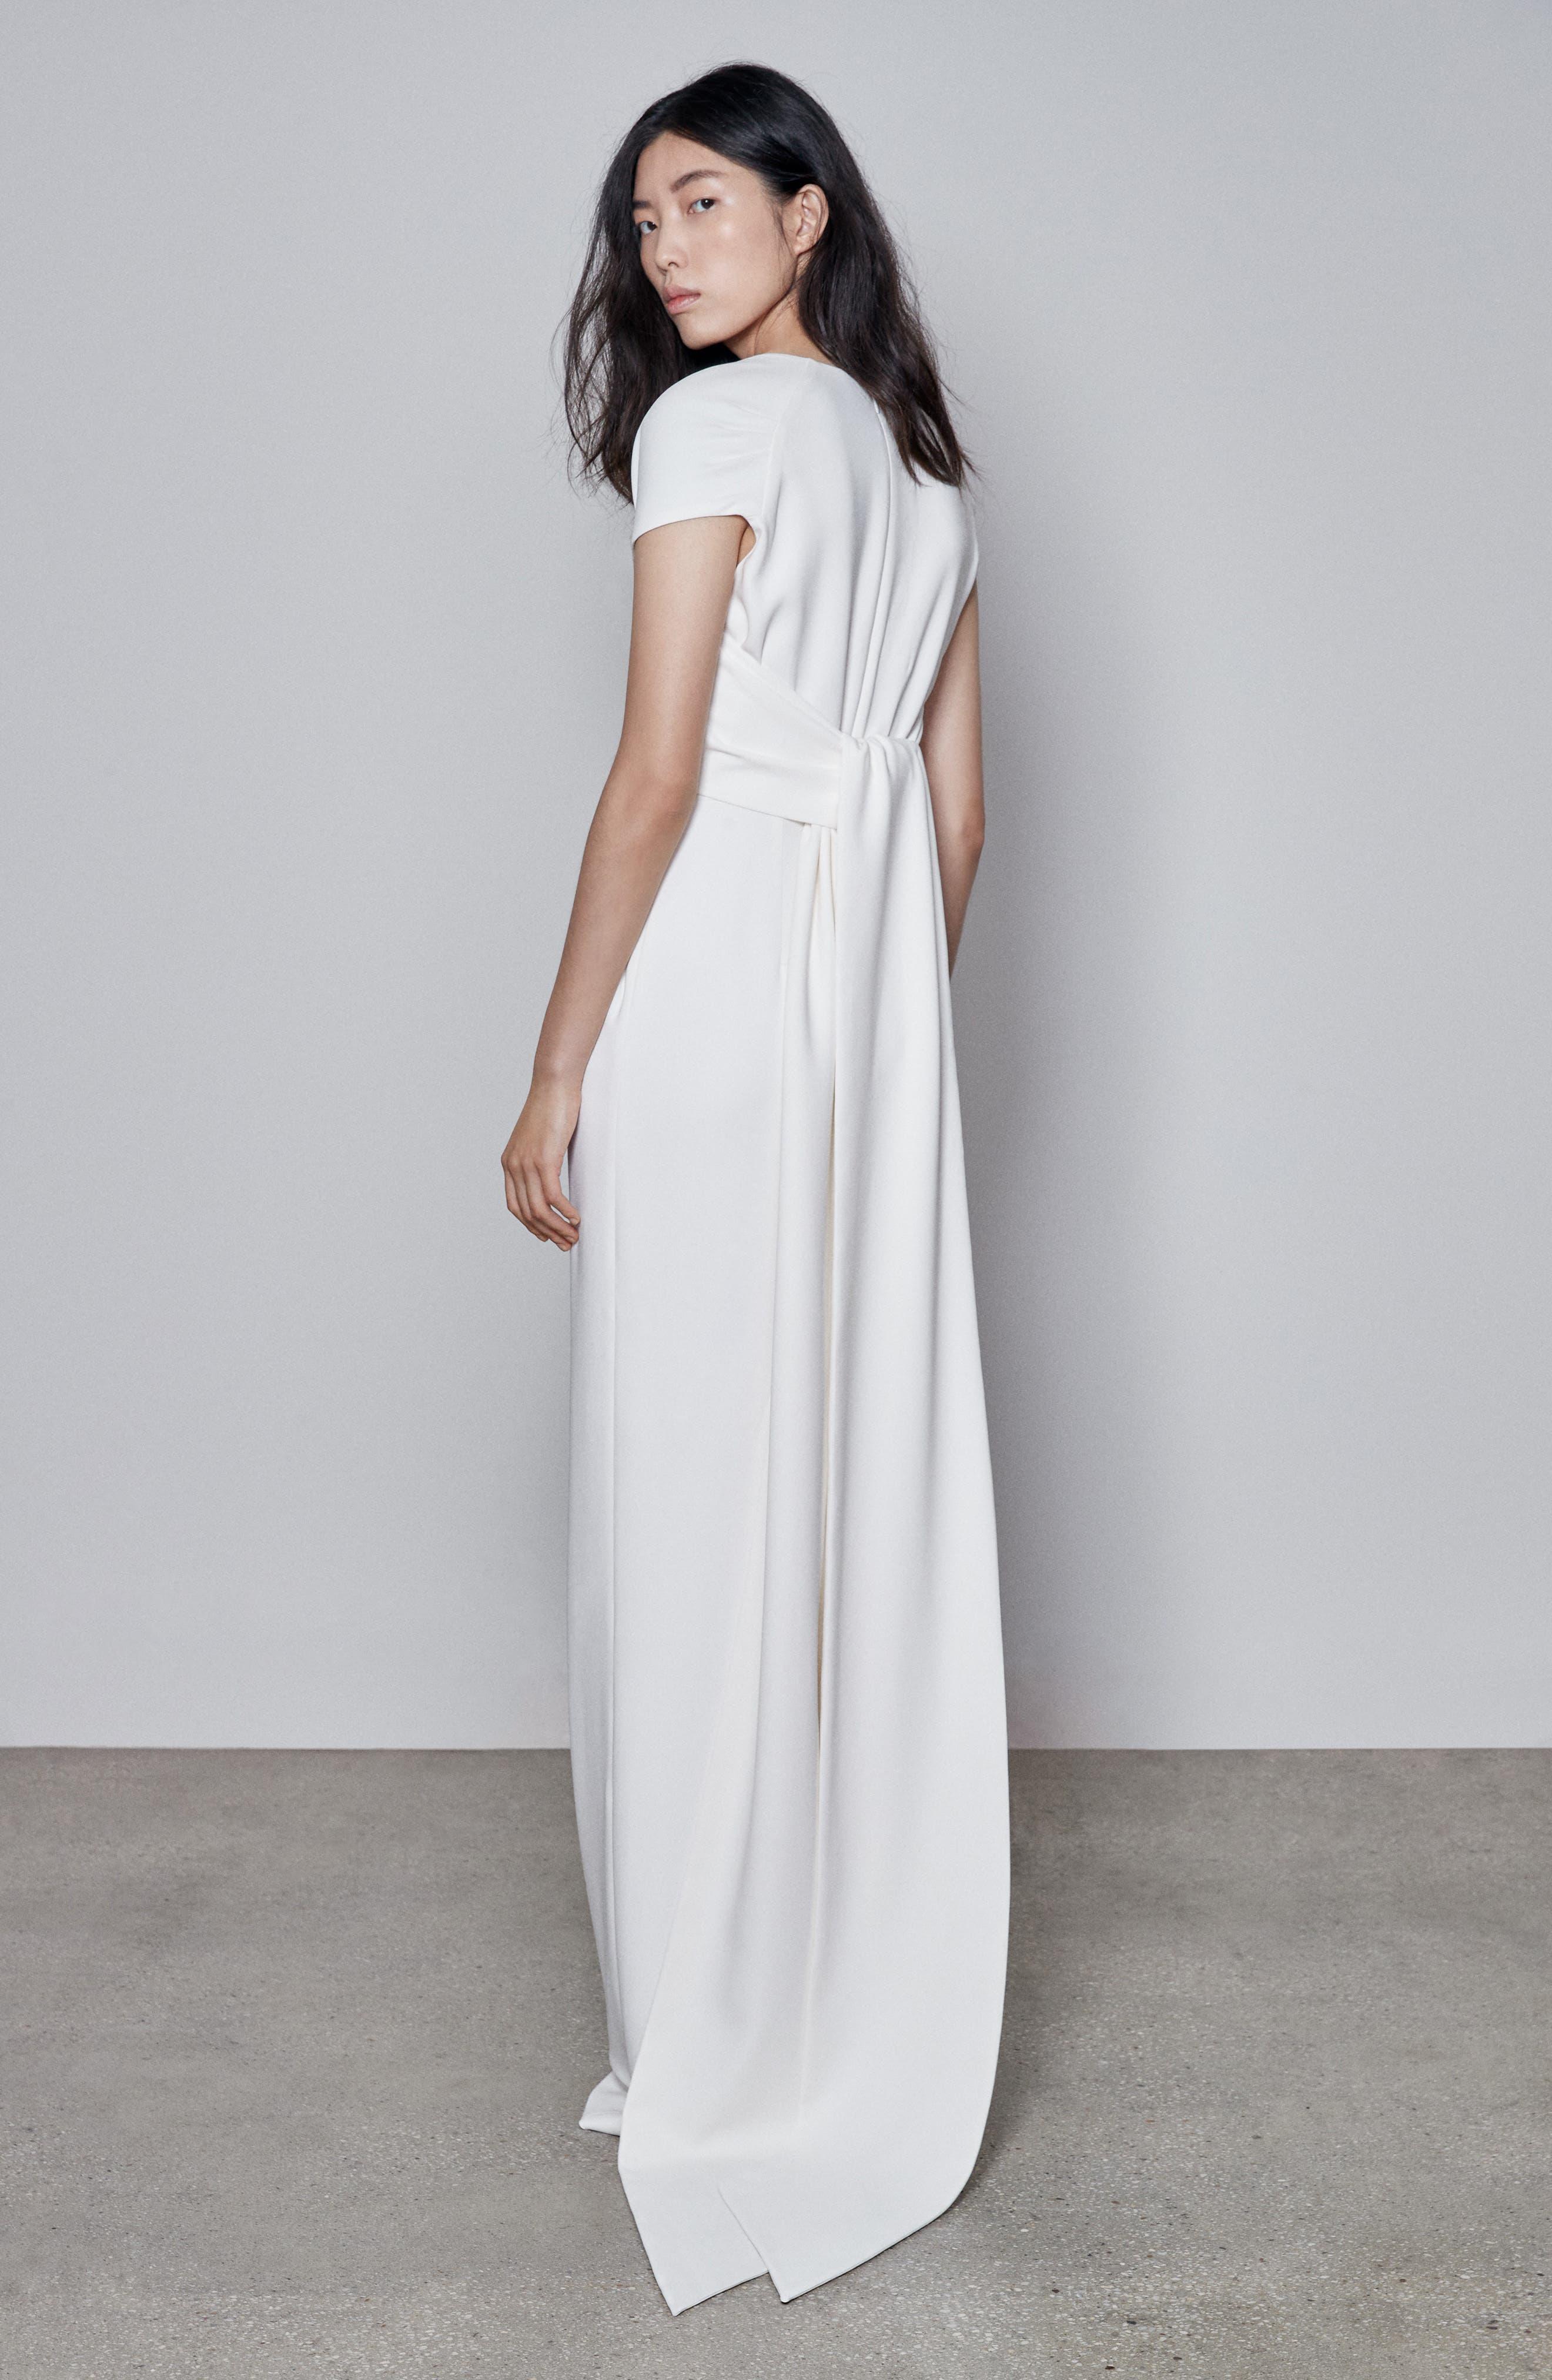 F18 Rose Cap Sleeve Wedding Dress,                             Alternate thumbnail 2, color,                             PURE WHITE